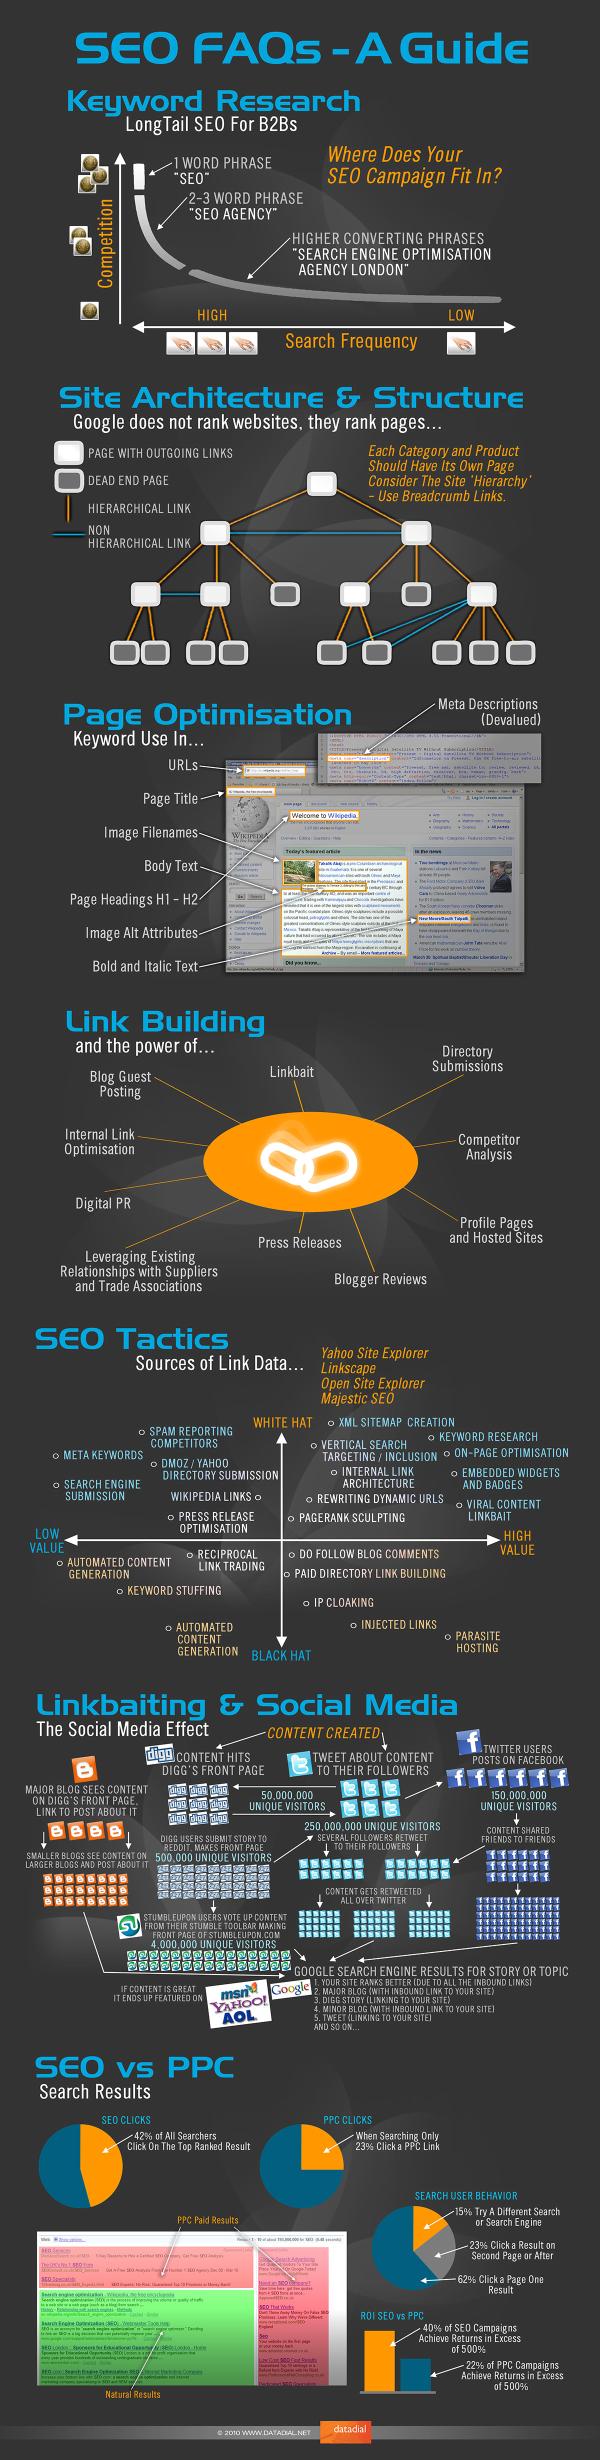 SEO Infographic1 resized 600